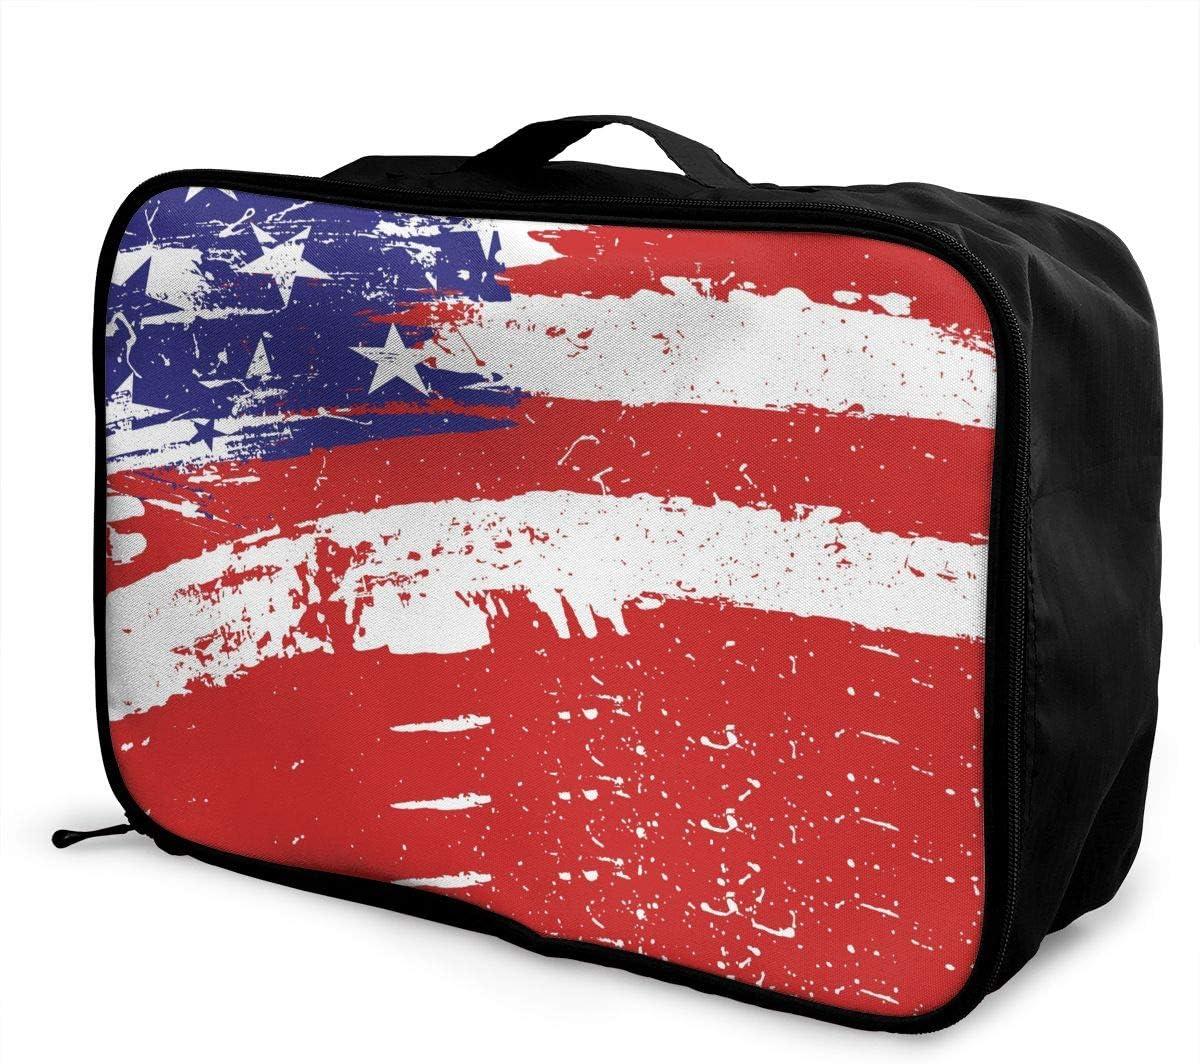 Top American Flag Travel Carry-on Luggage Weekender Bag Overnight Tote Flight Duffel In Trolley Handle